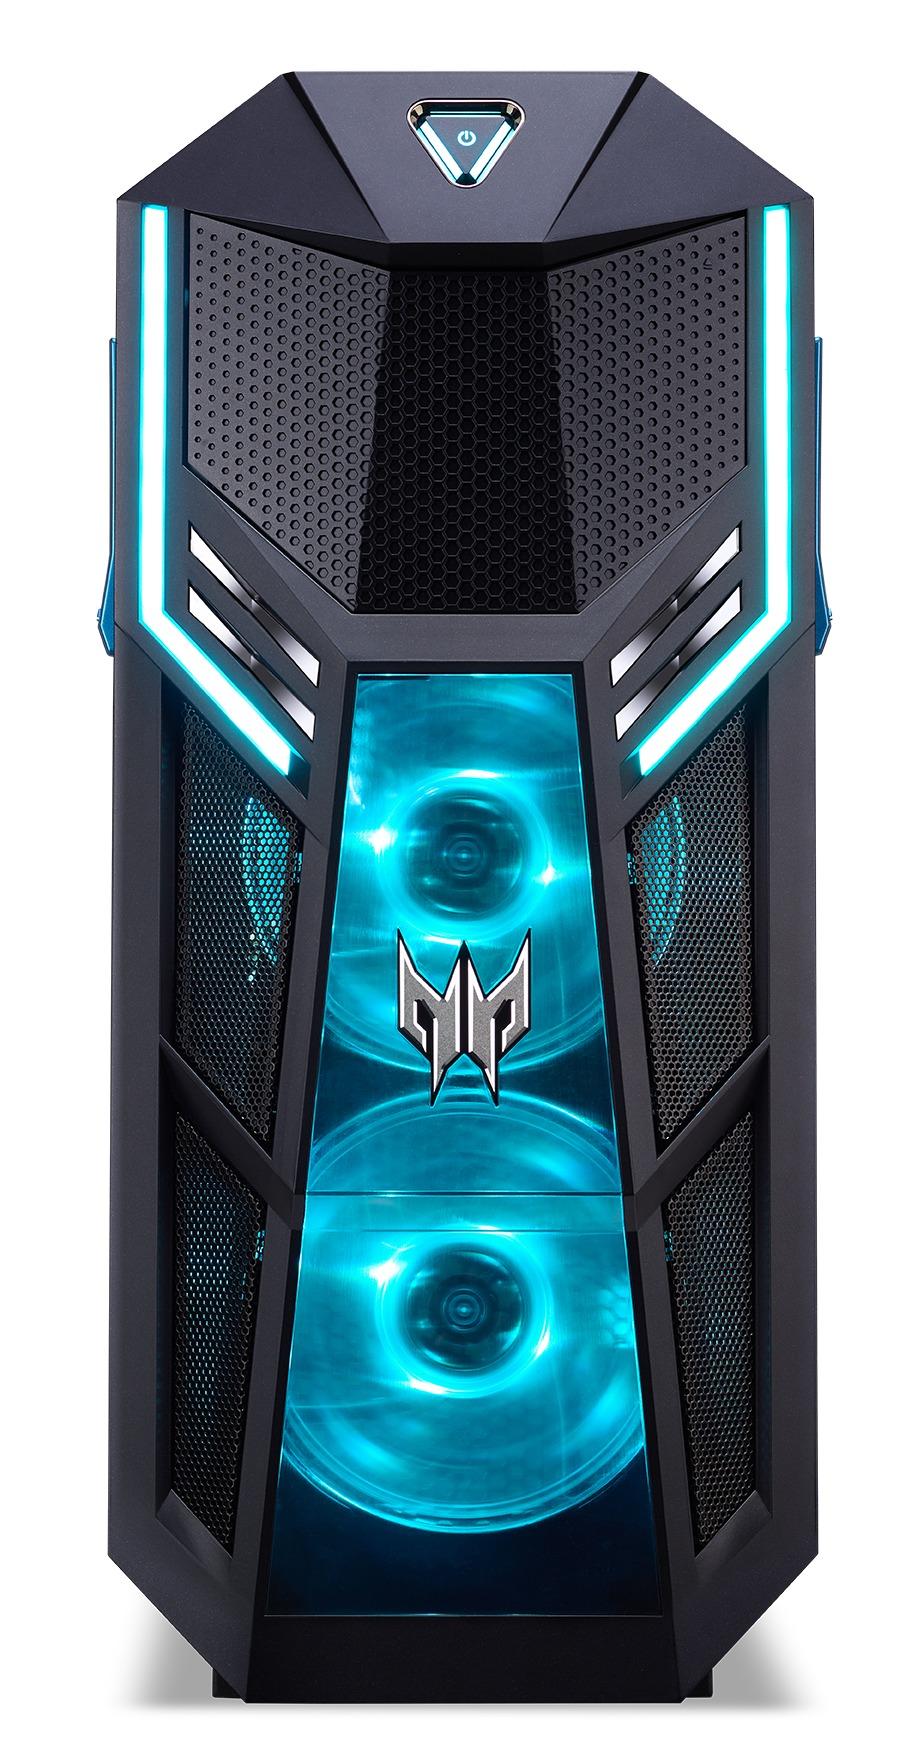 Korting Acer Predator Orion 5000 605s I9202 desktop